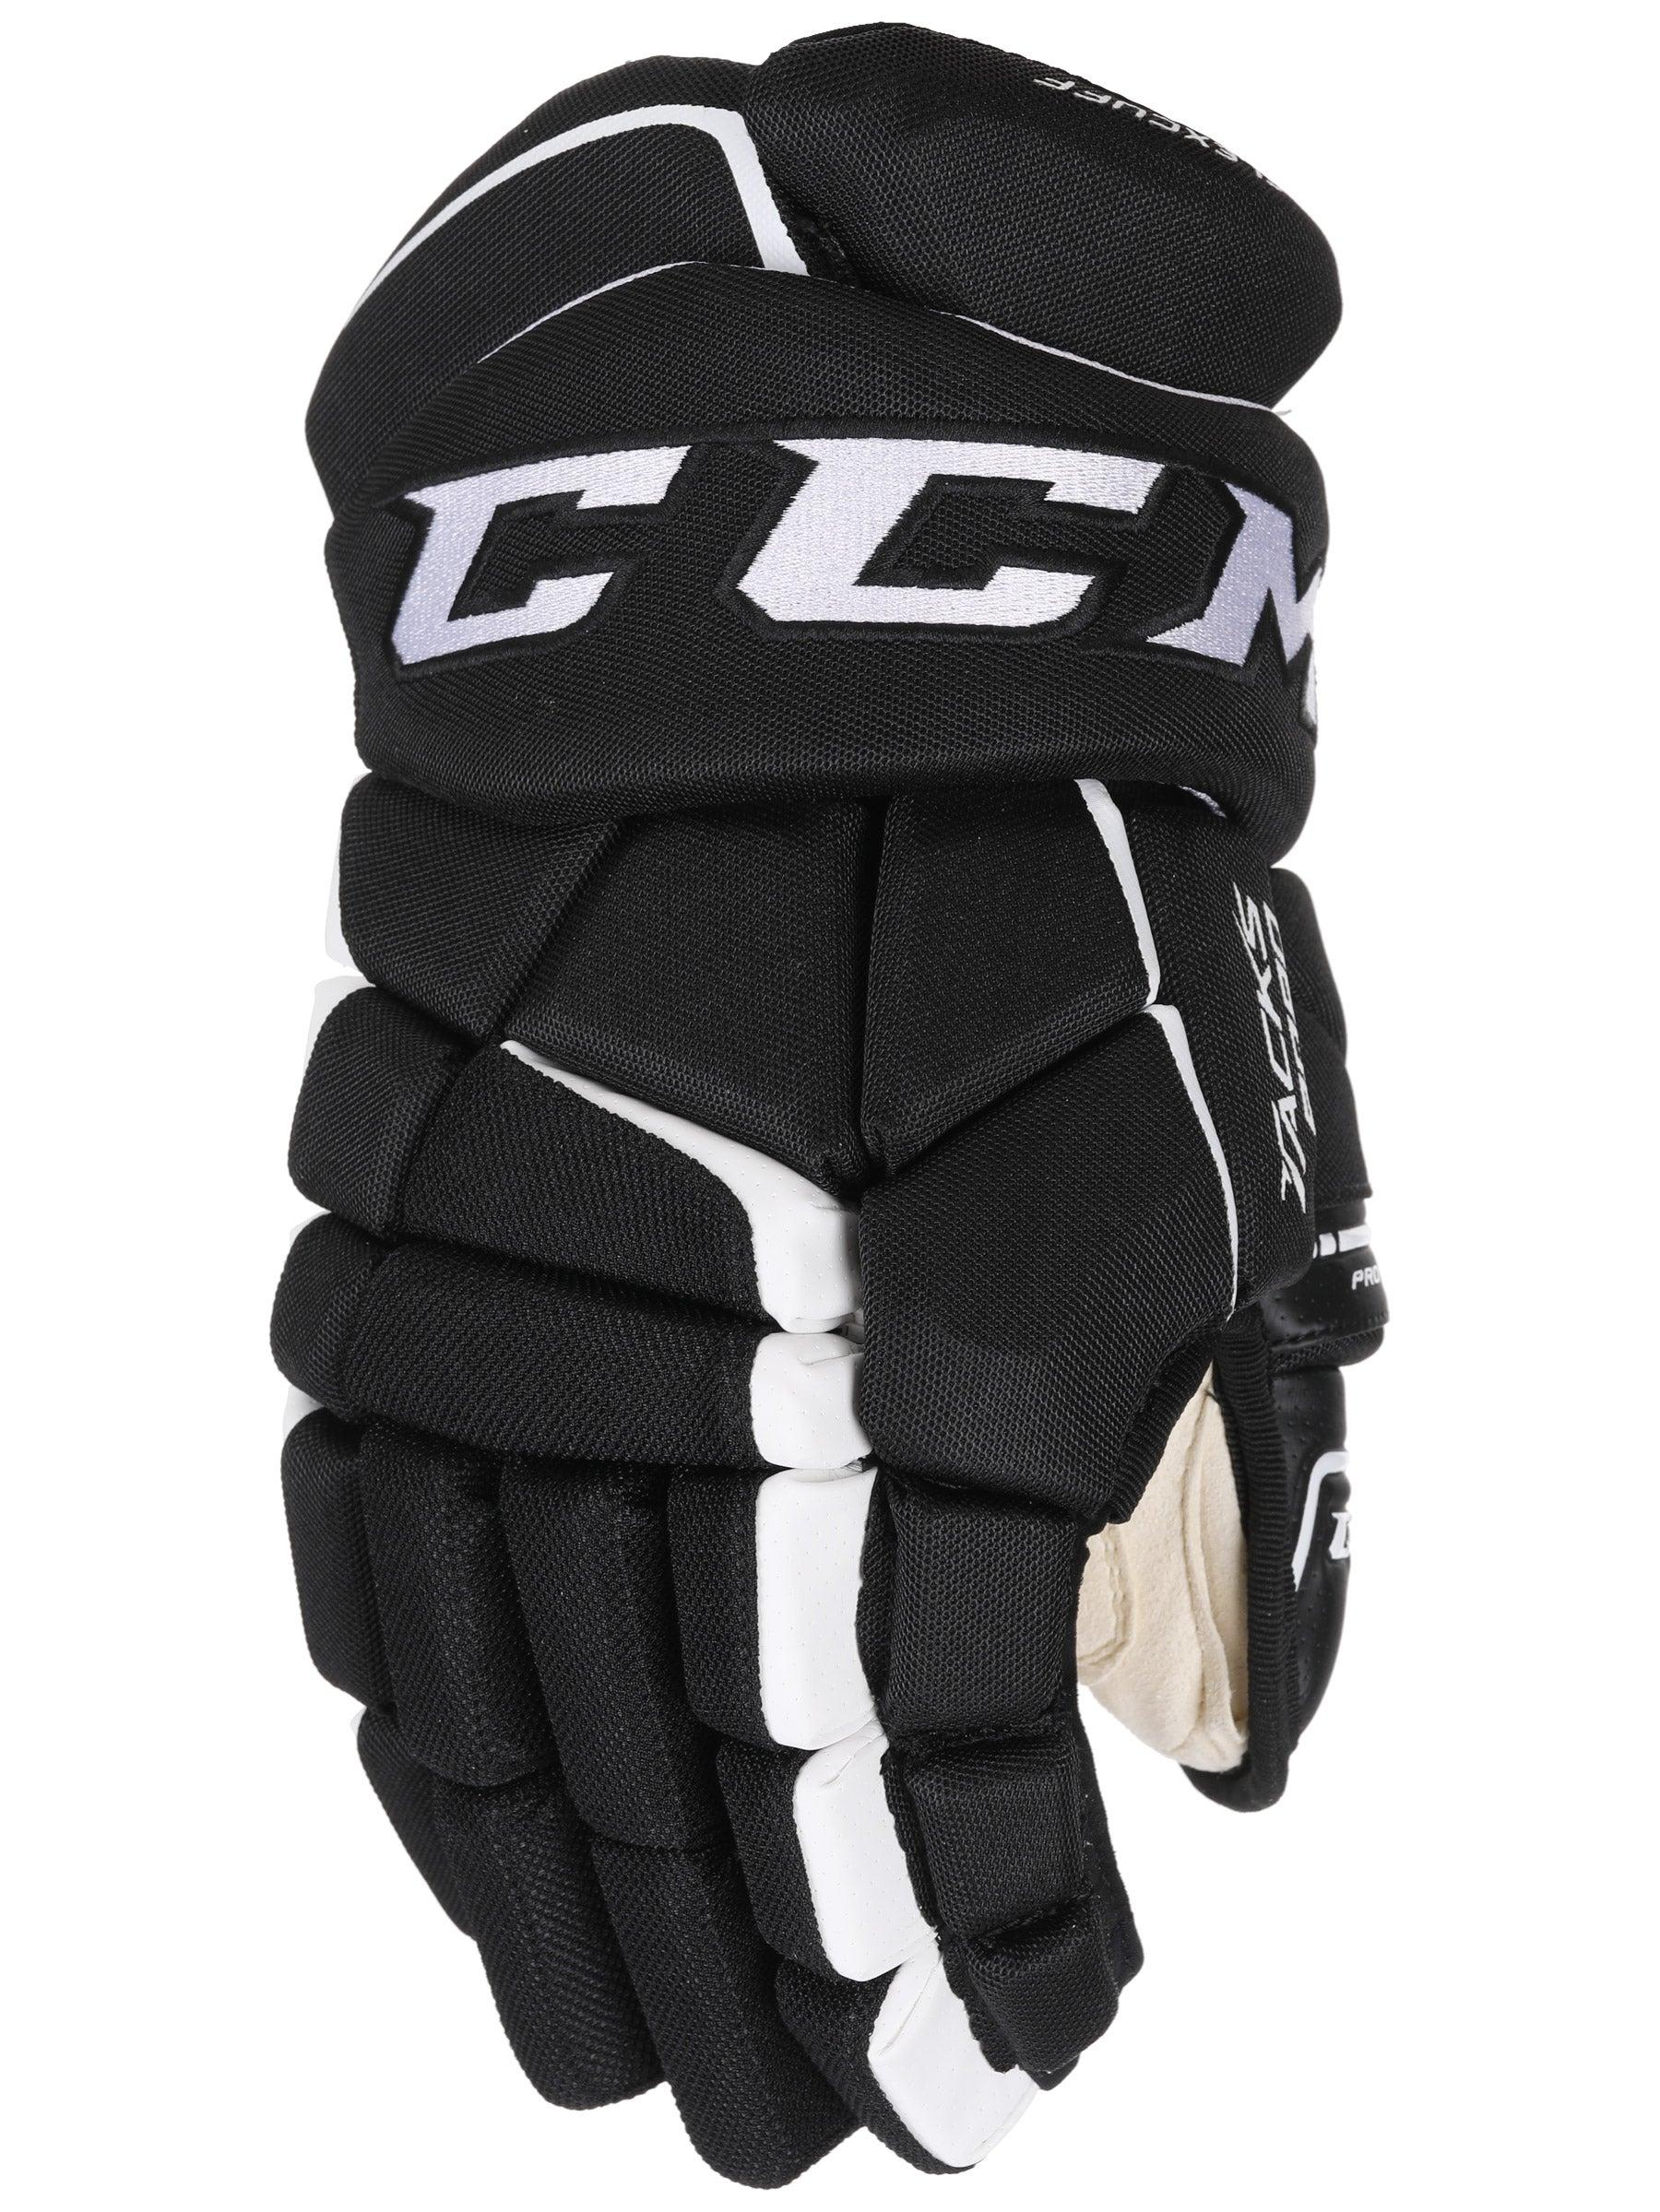 "Ccm Tacks 9080 Gloves 10"""